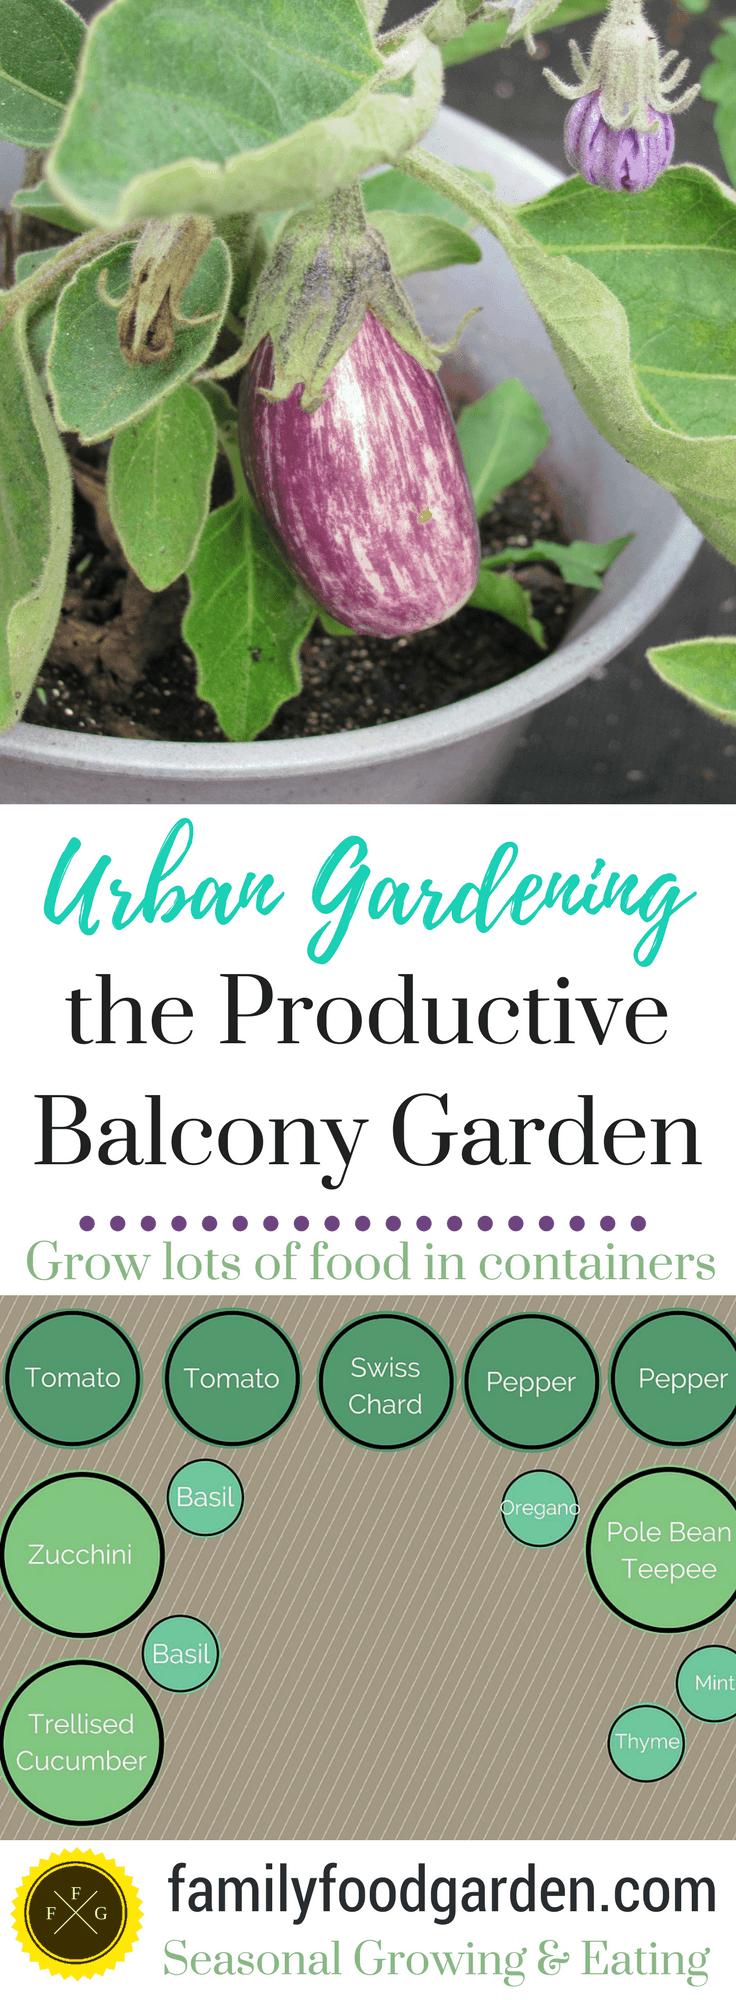 Productive Balcony Garden for Urban Gardening